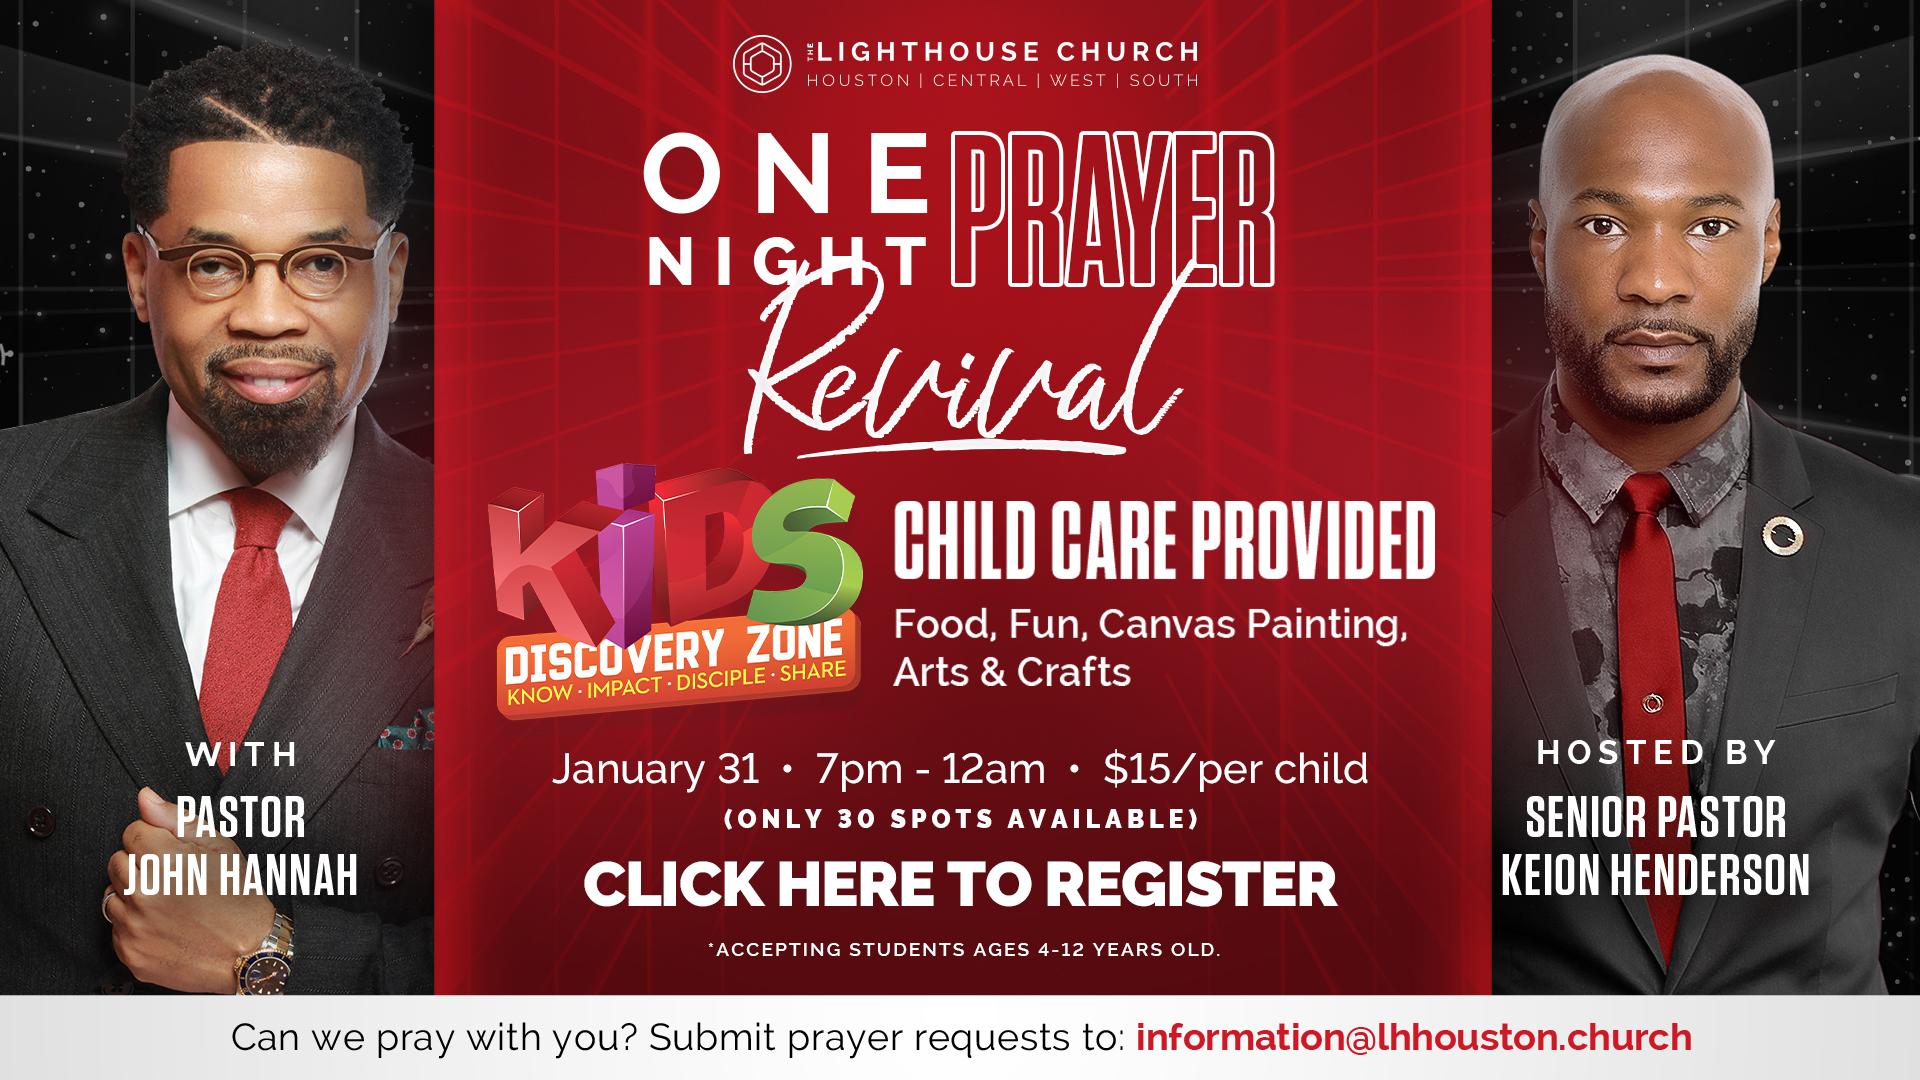 One Night Prayer